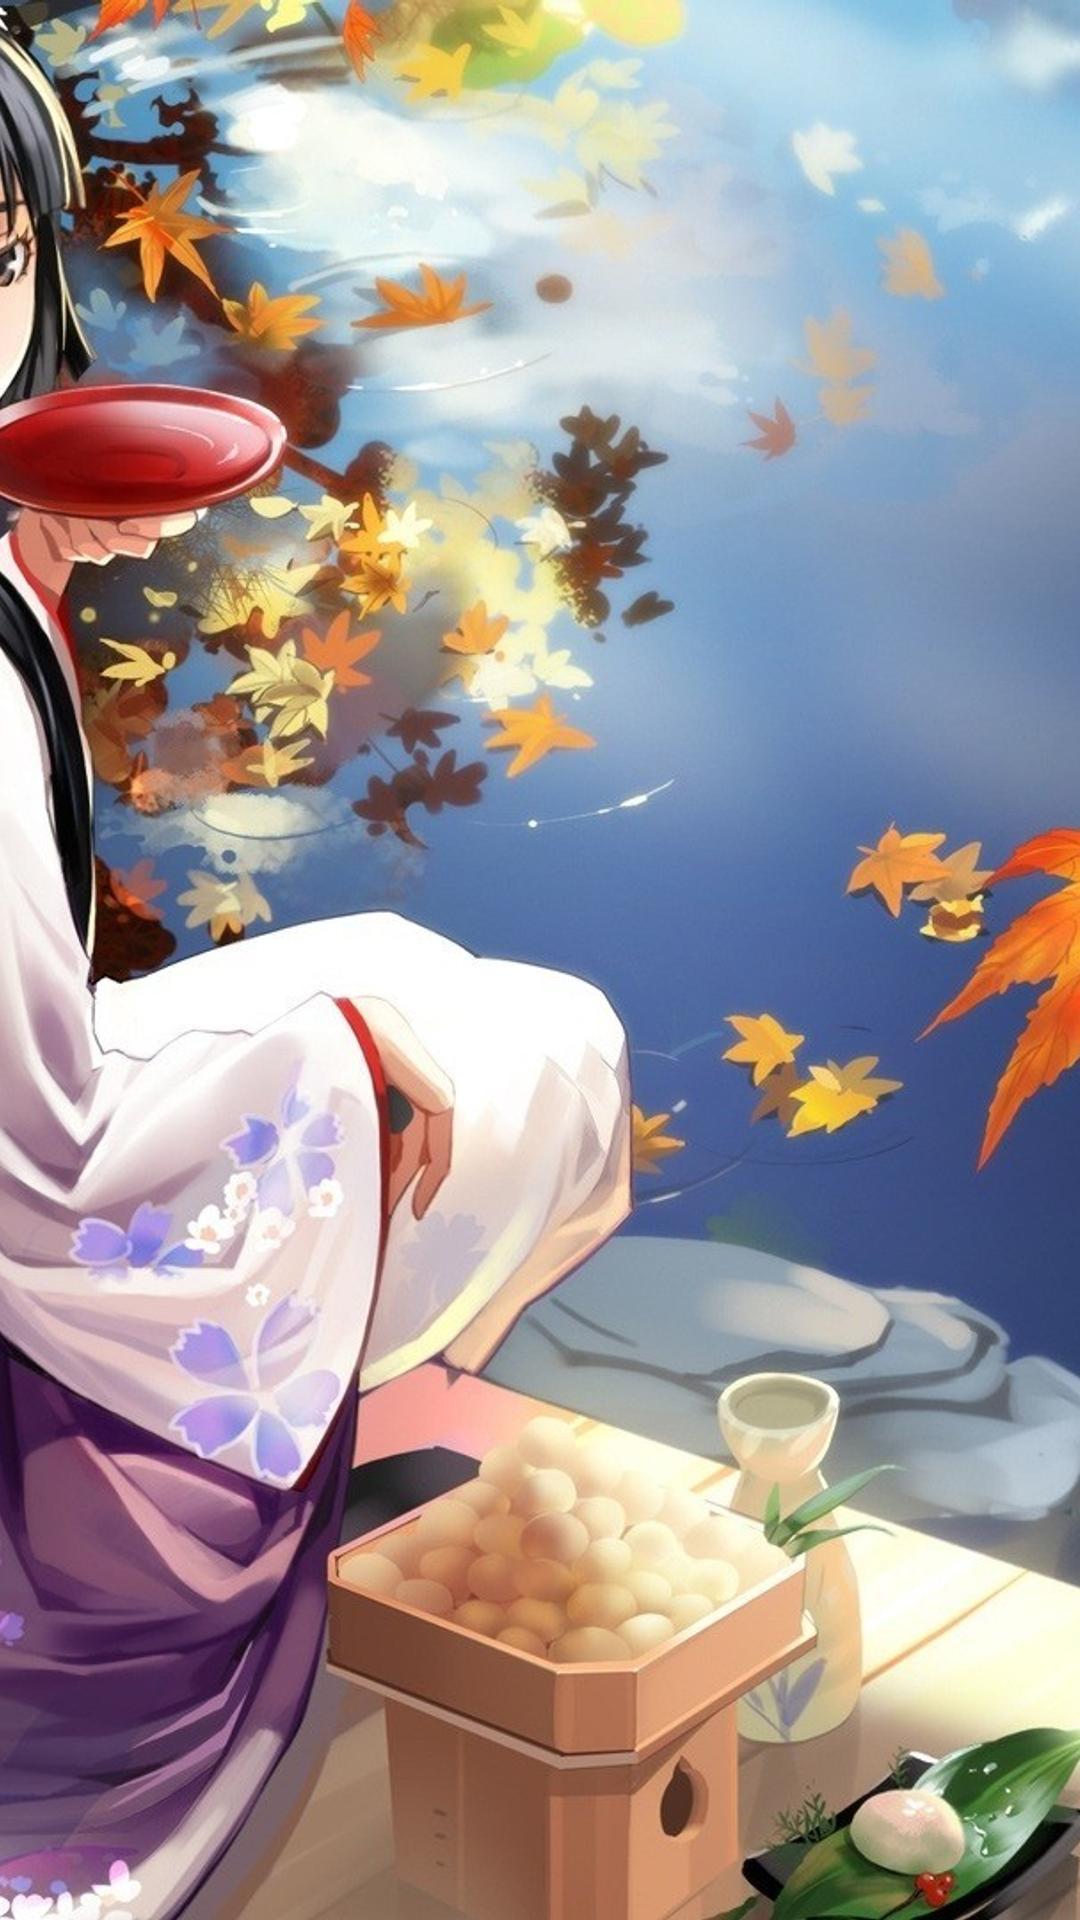 Download Wallpaper 1080x1920 Anime Geisha